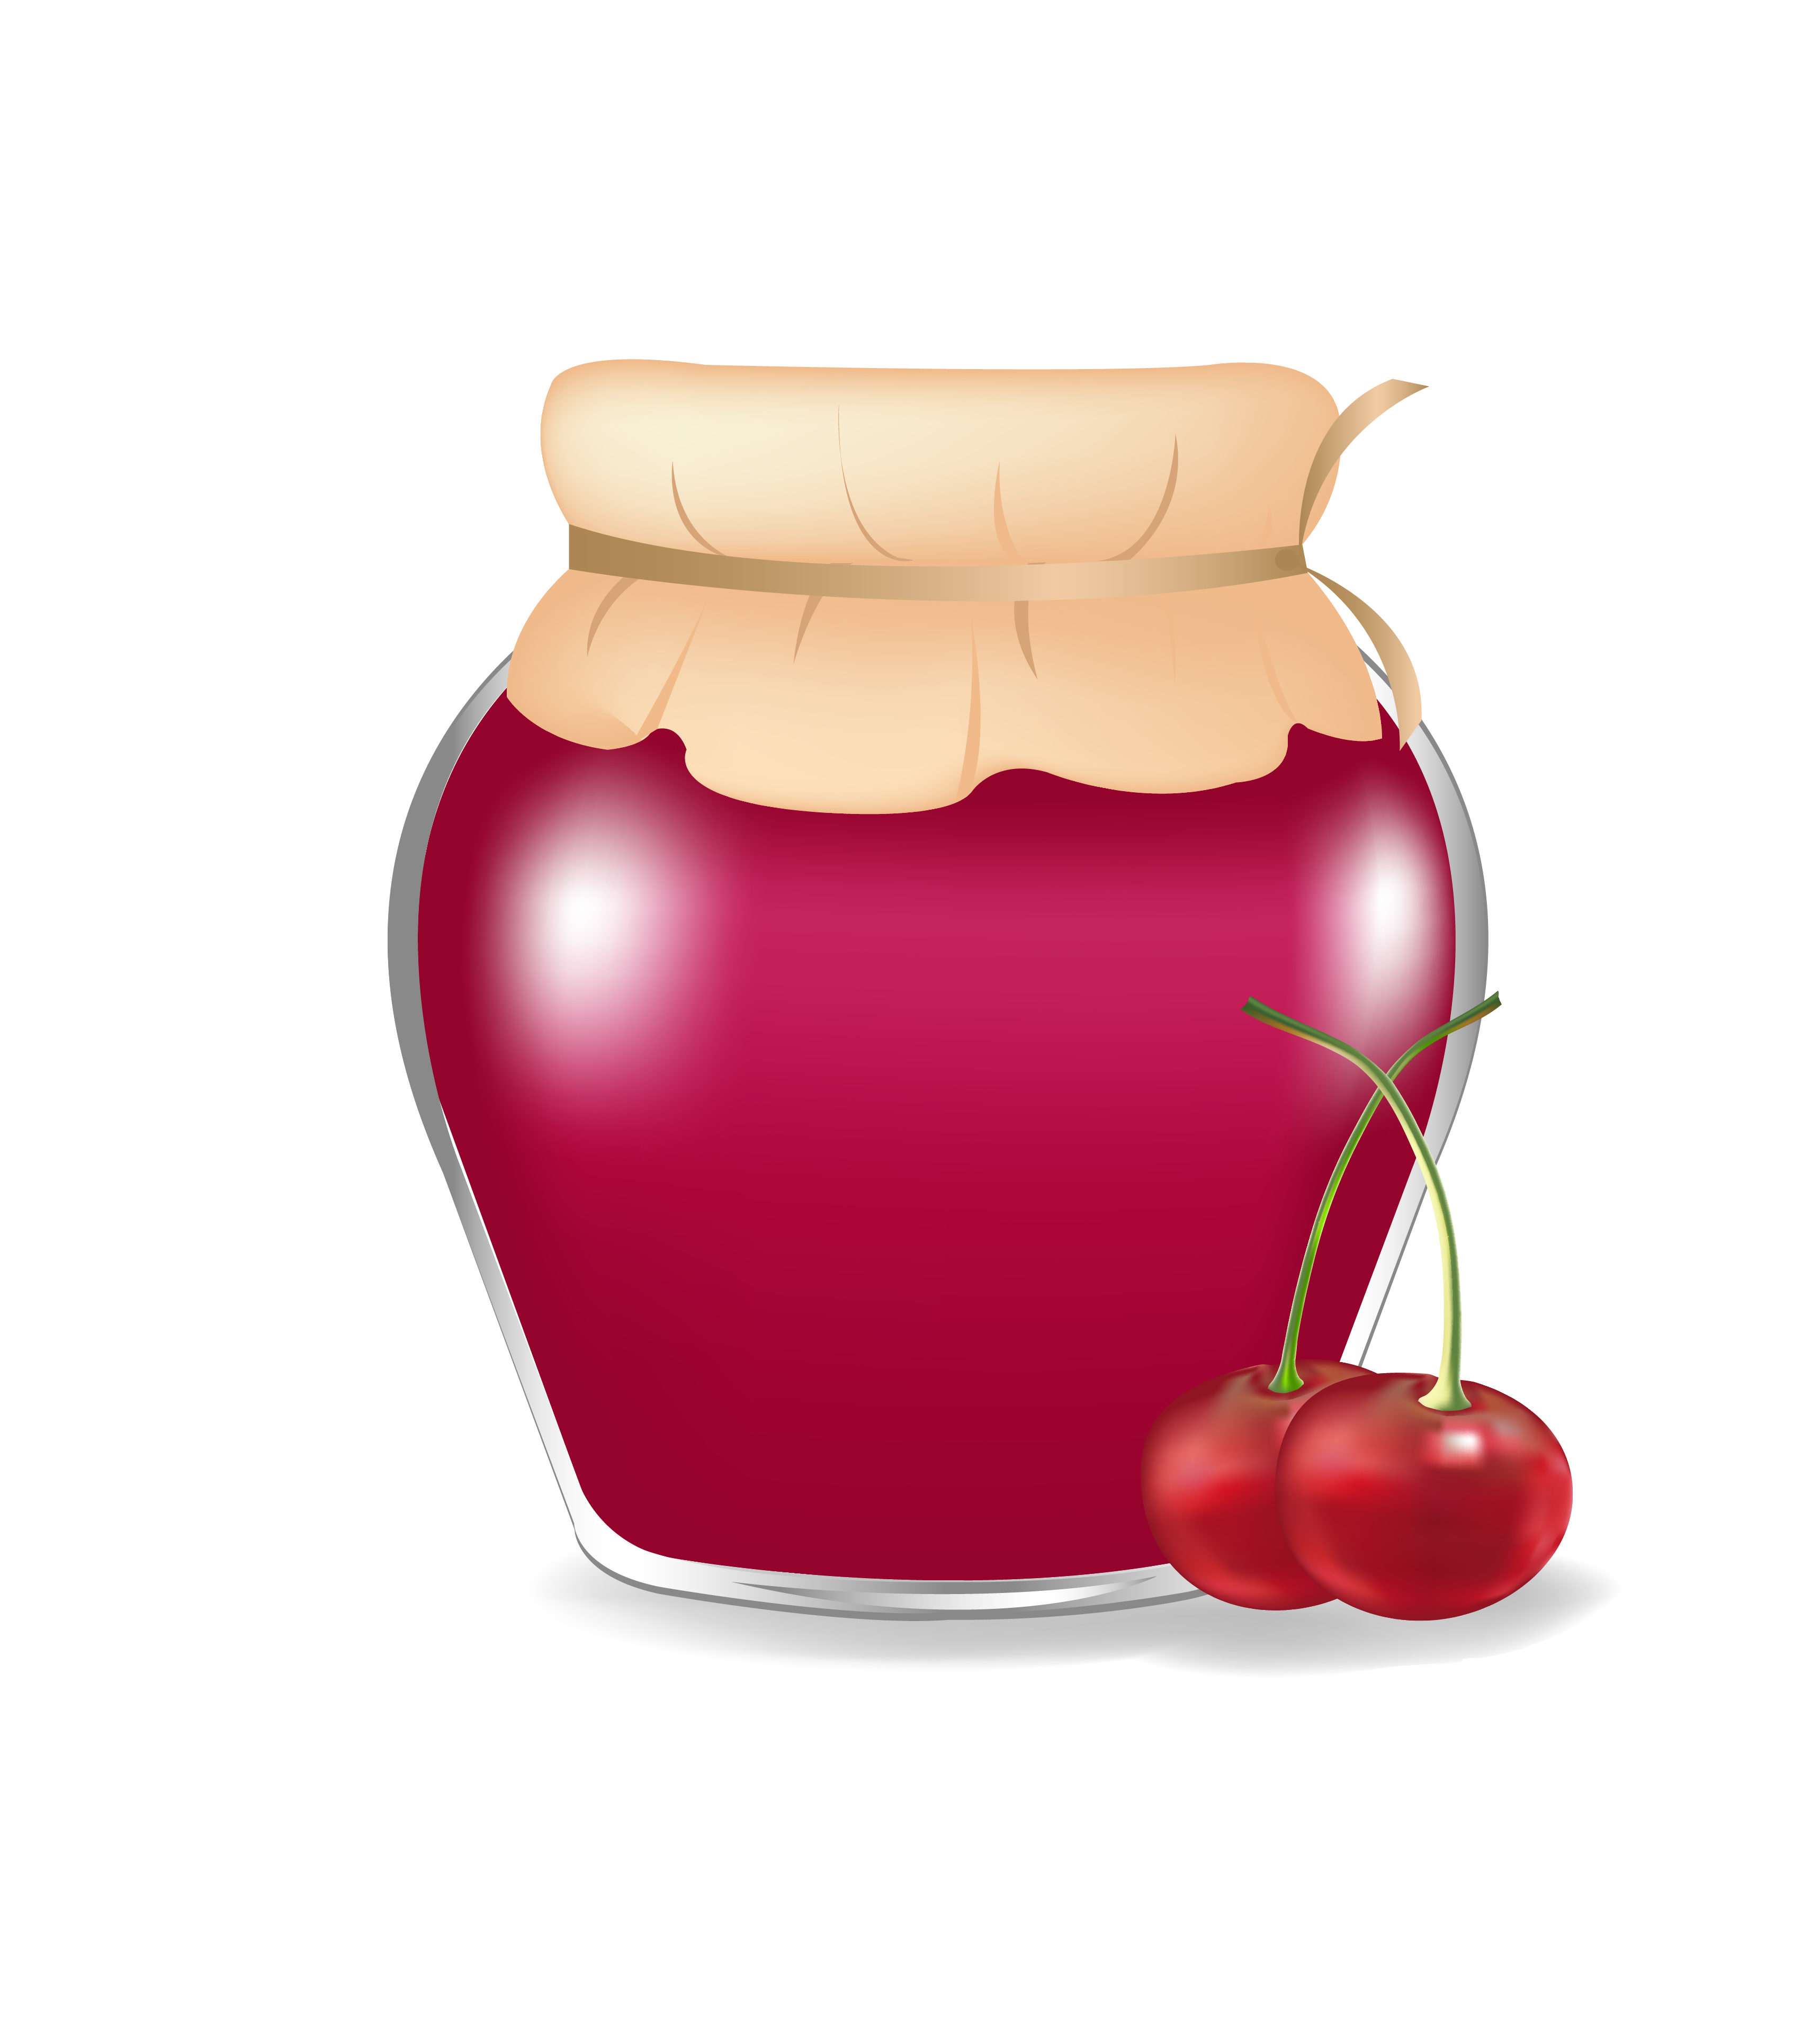 Clipart bread jam. Fruit preserves jar strawberry